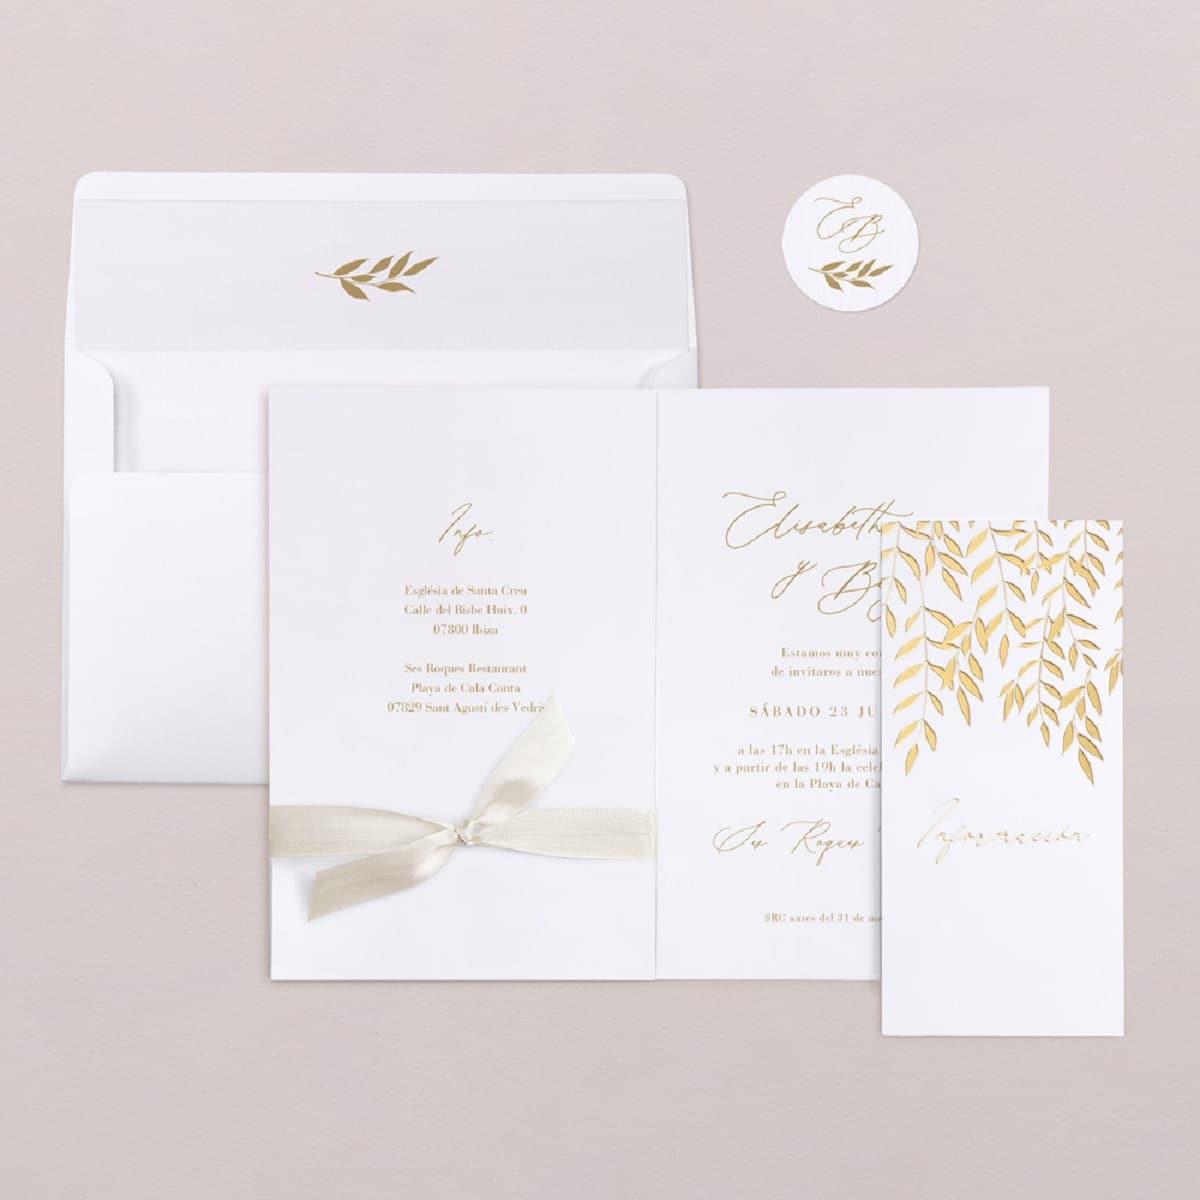 invitaciones elegantes